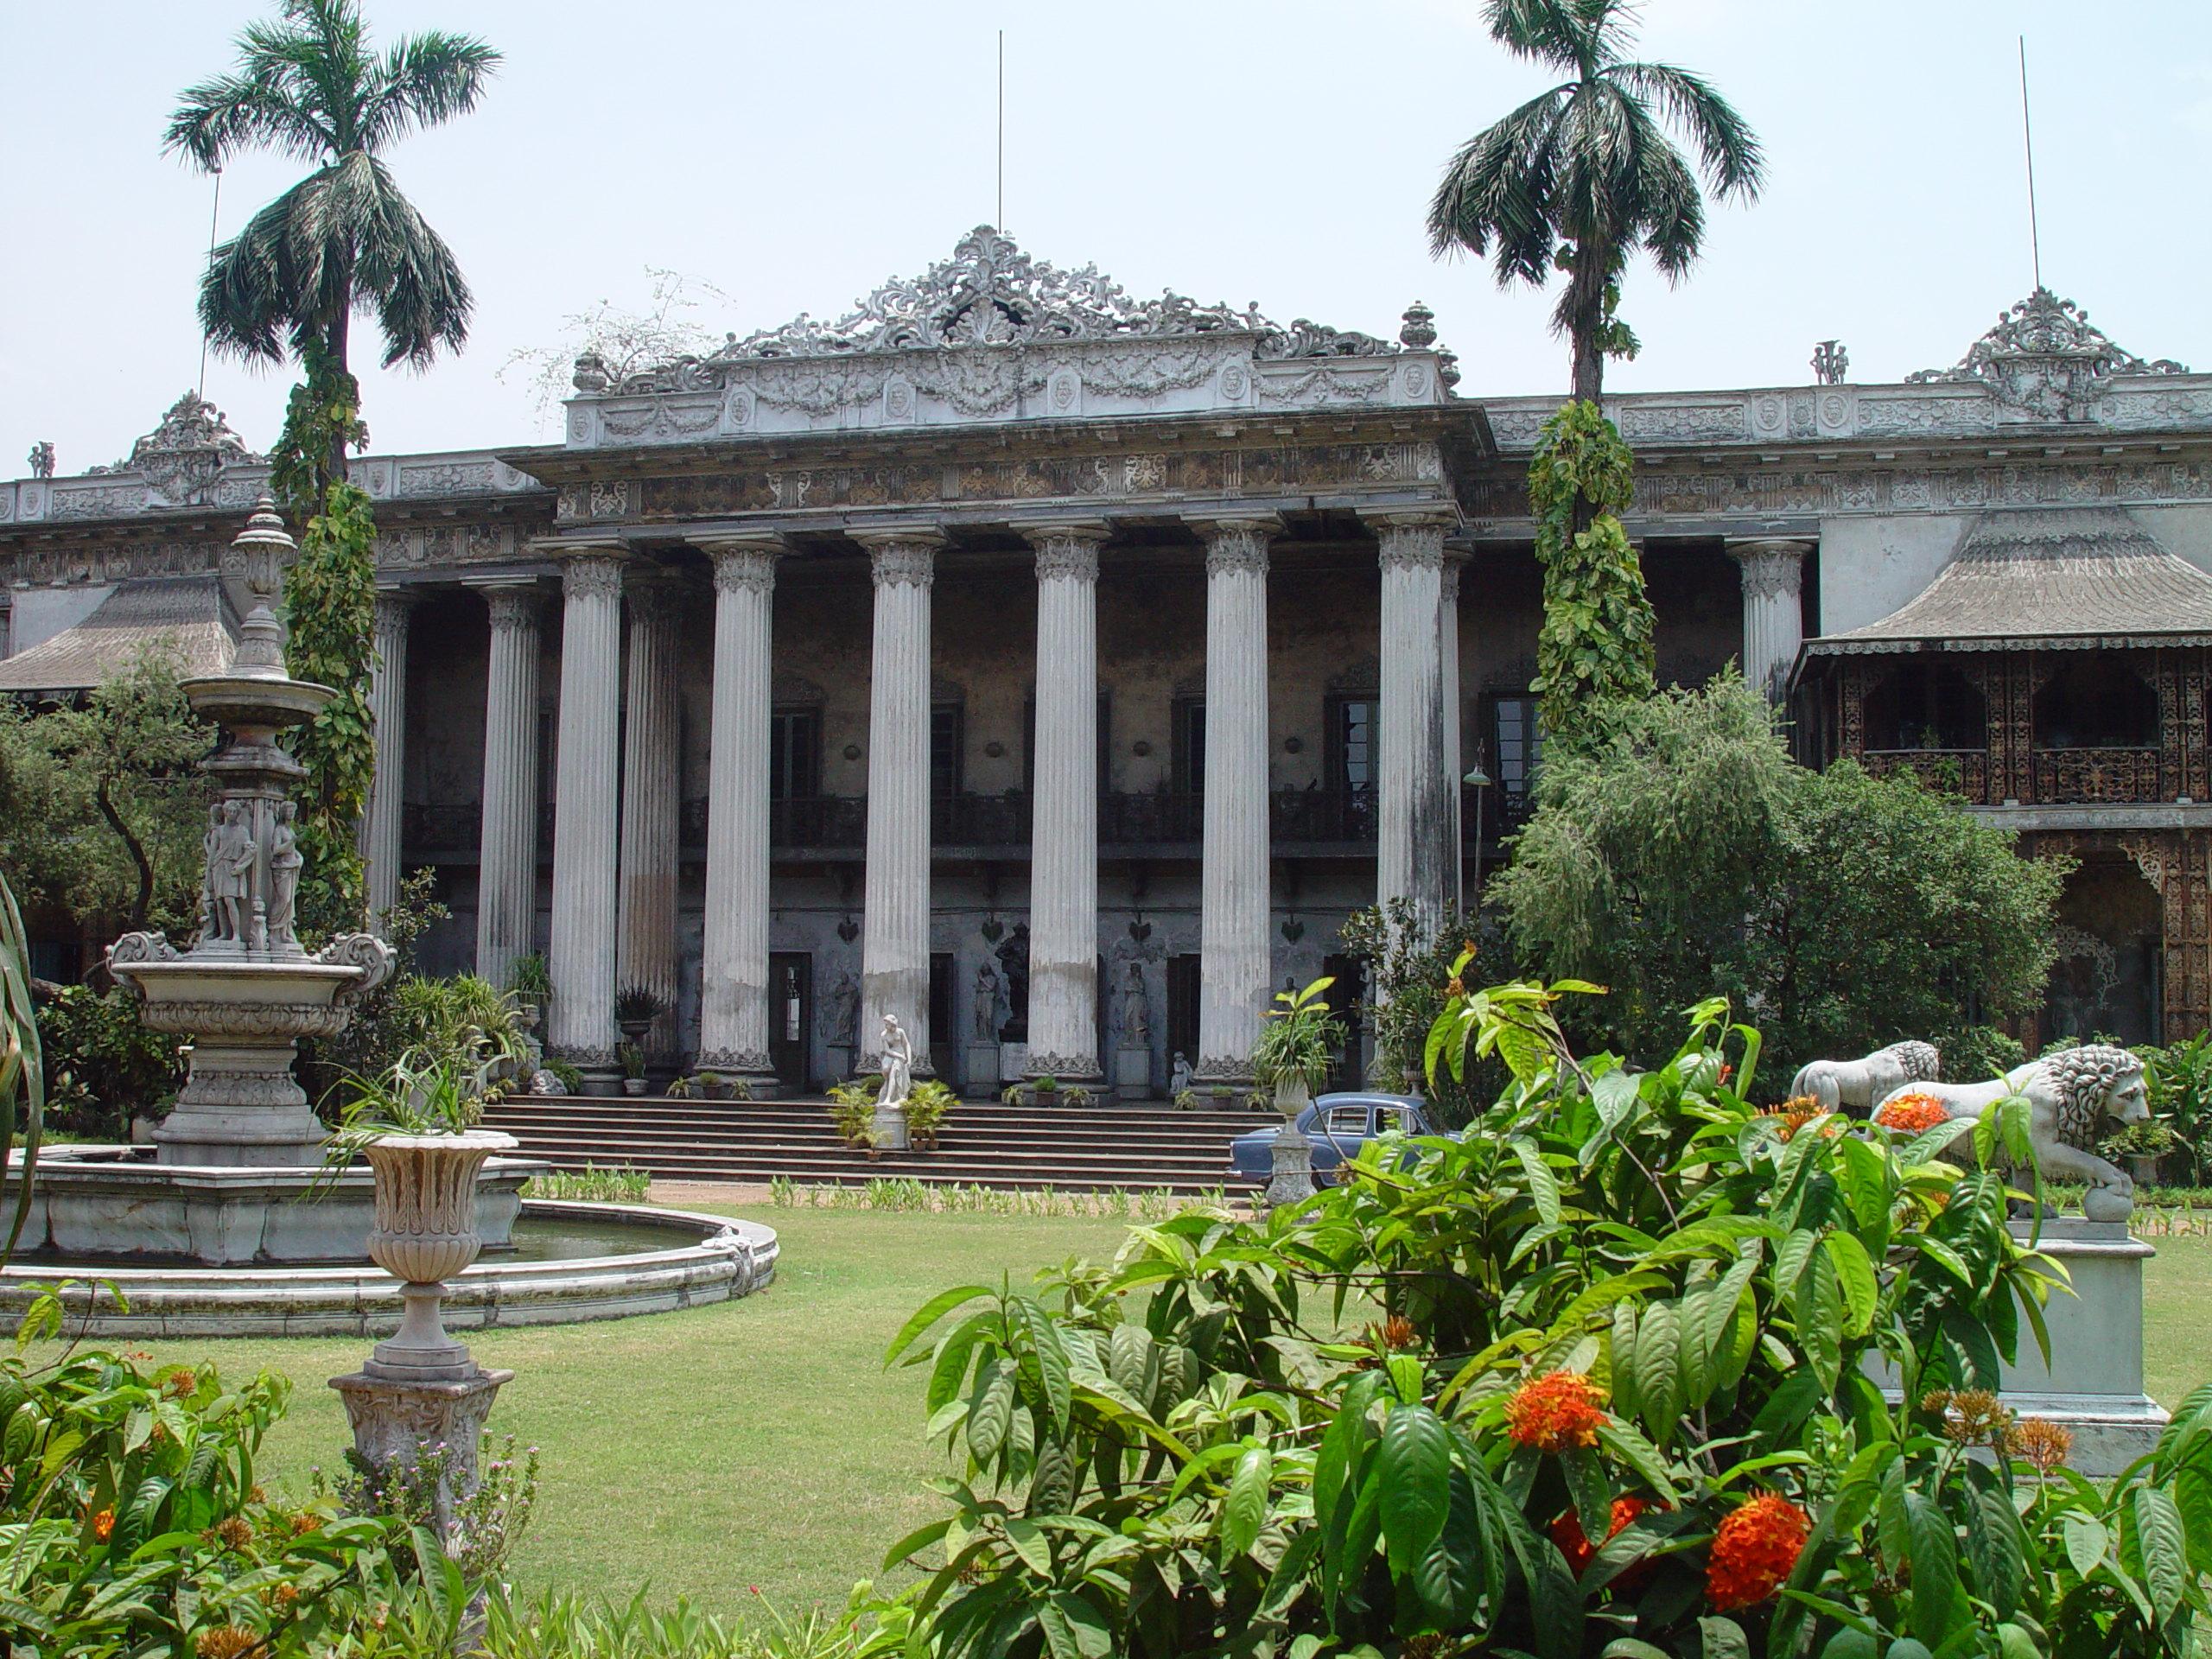 Marble_Palace_Kolkata.jpg (2560×1920)